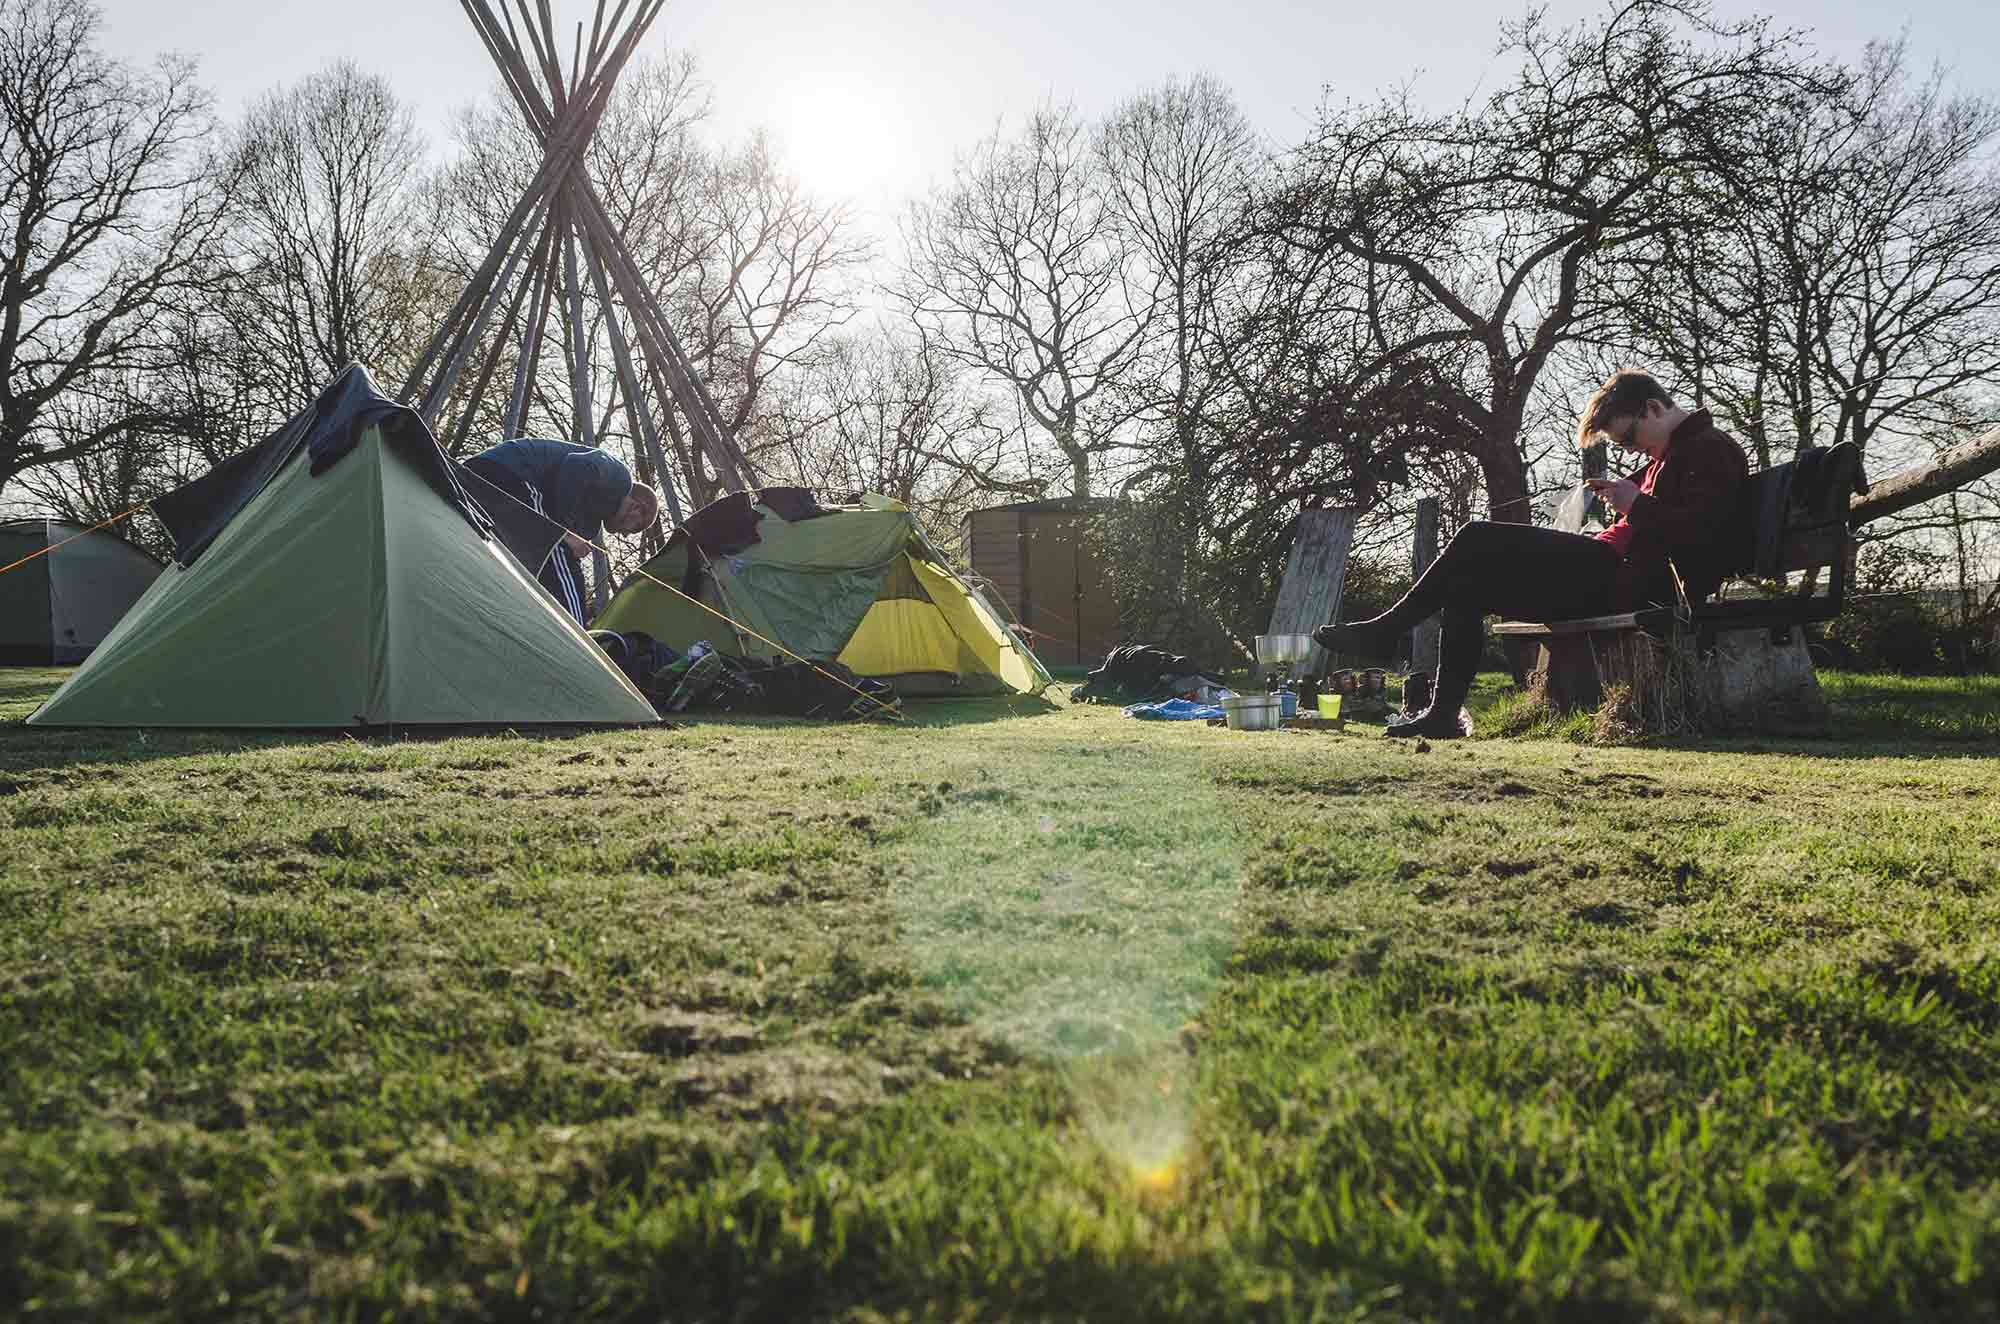 Campingplatz_Roetgen_Froschperspektive Bilder